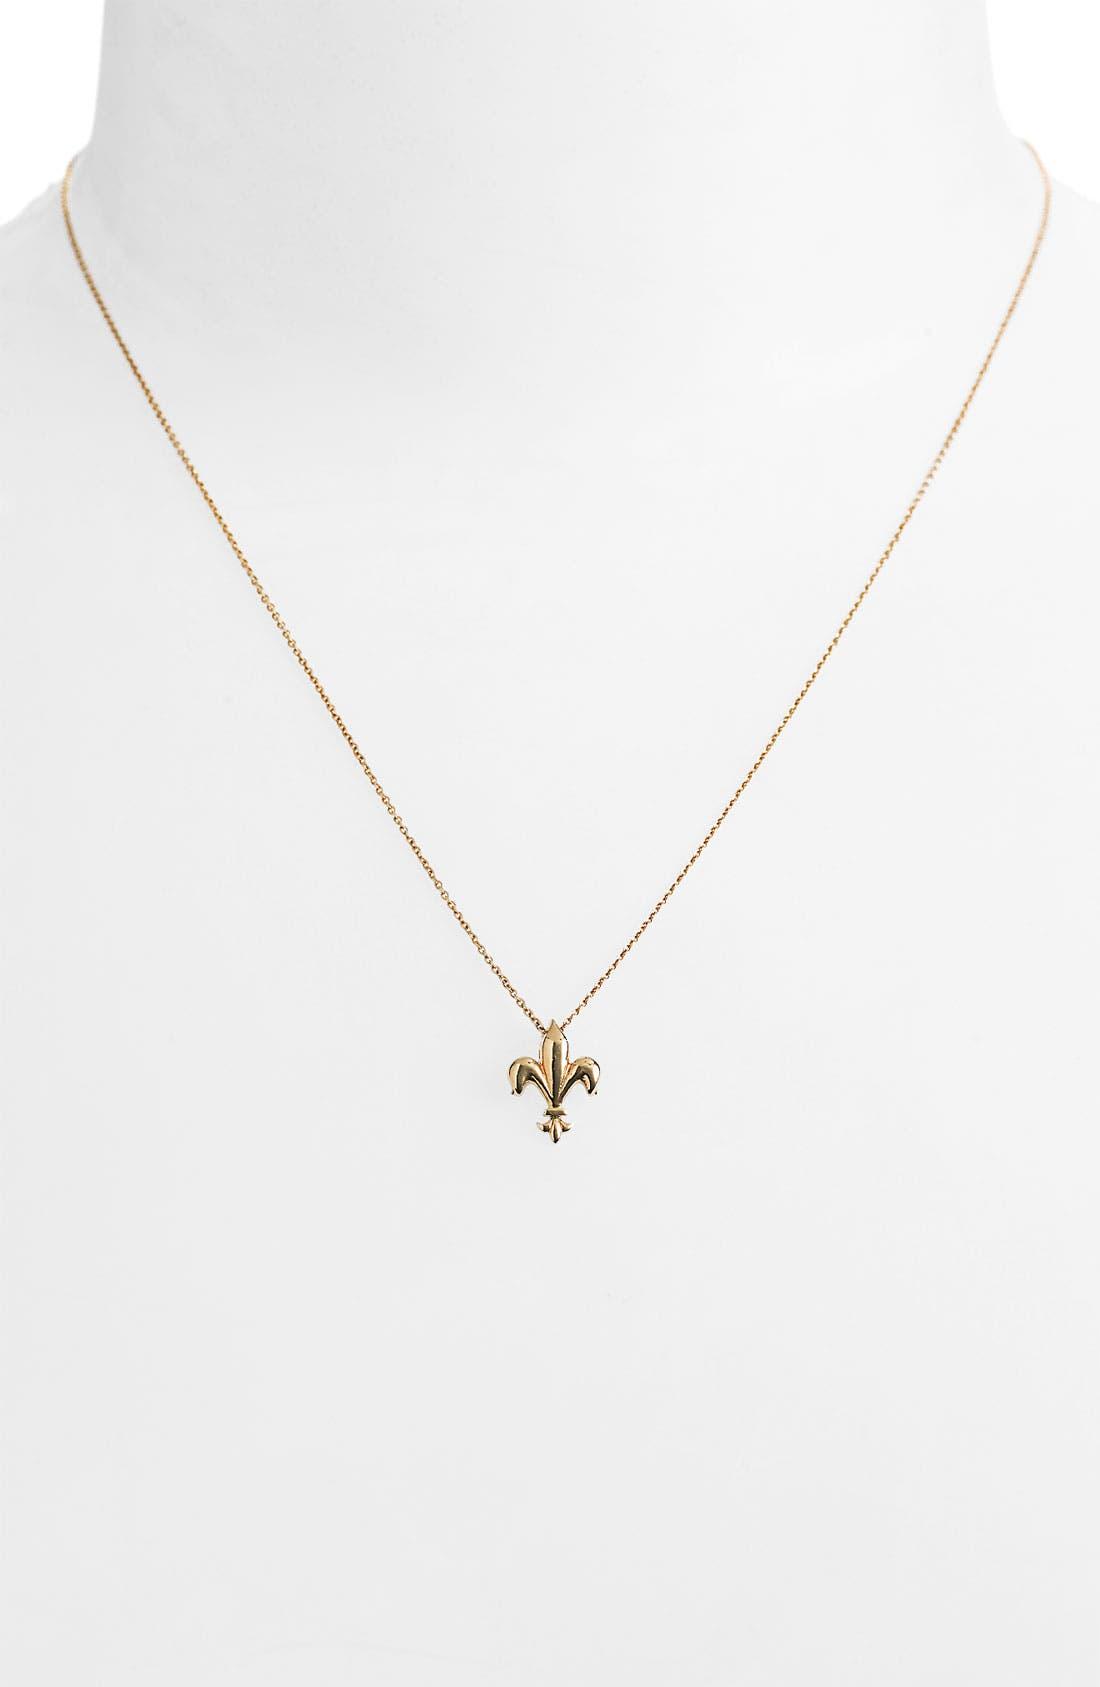 Alternate Image 1 Selected - Roberto Coin 'Tiny Treasures' Fleur de Lis Necklace